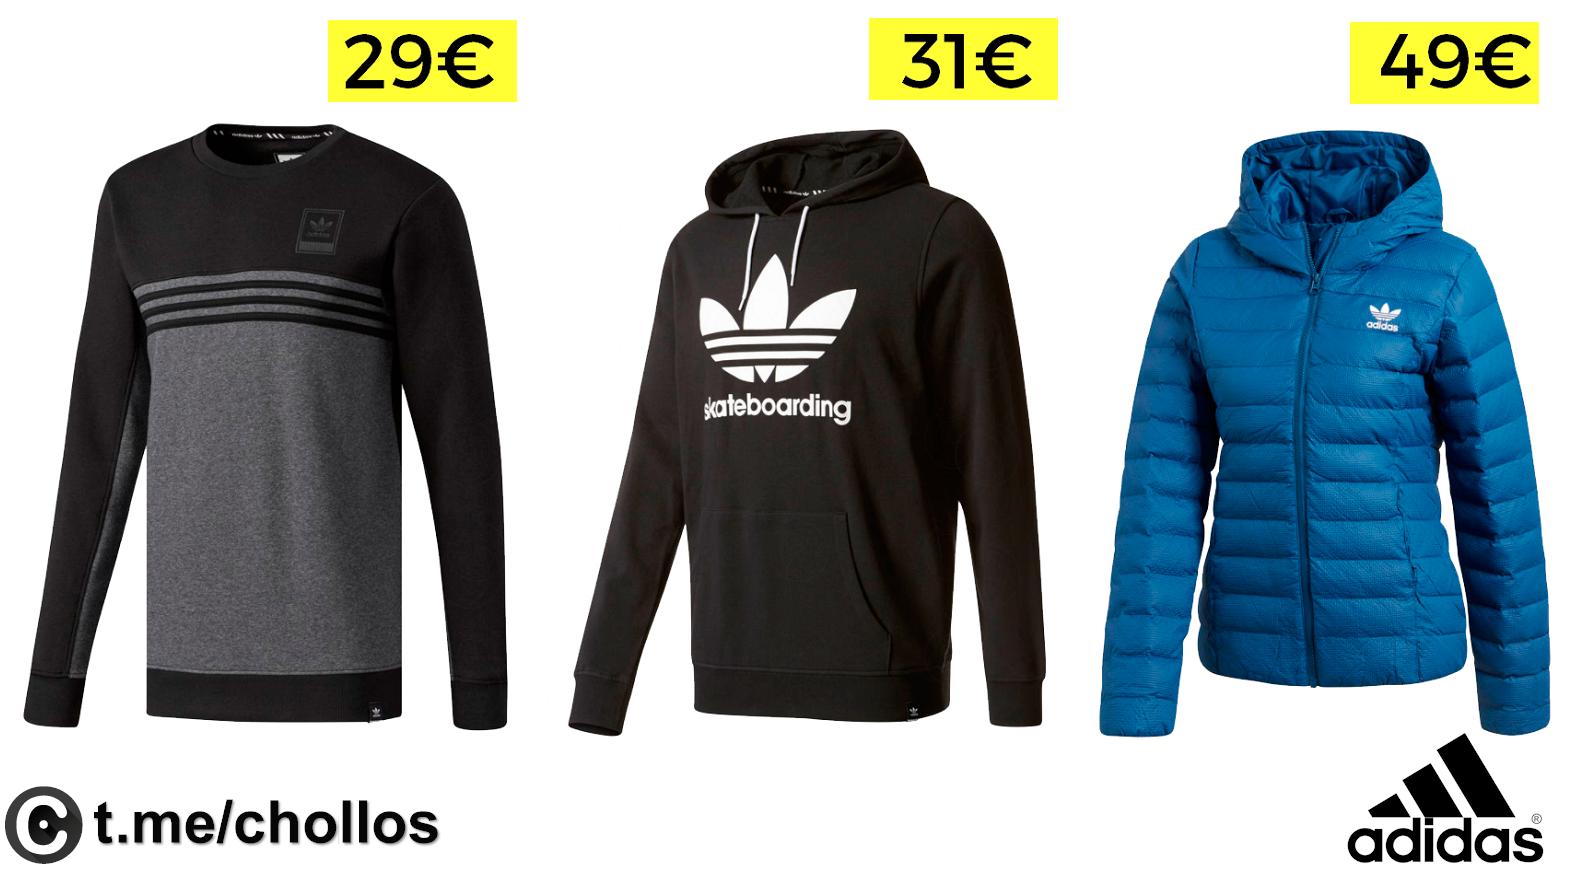 BlackFriday Adidas